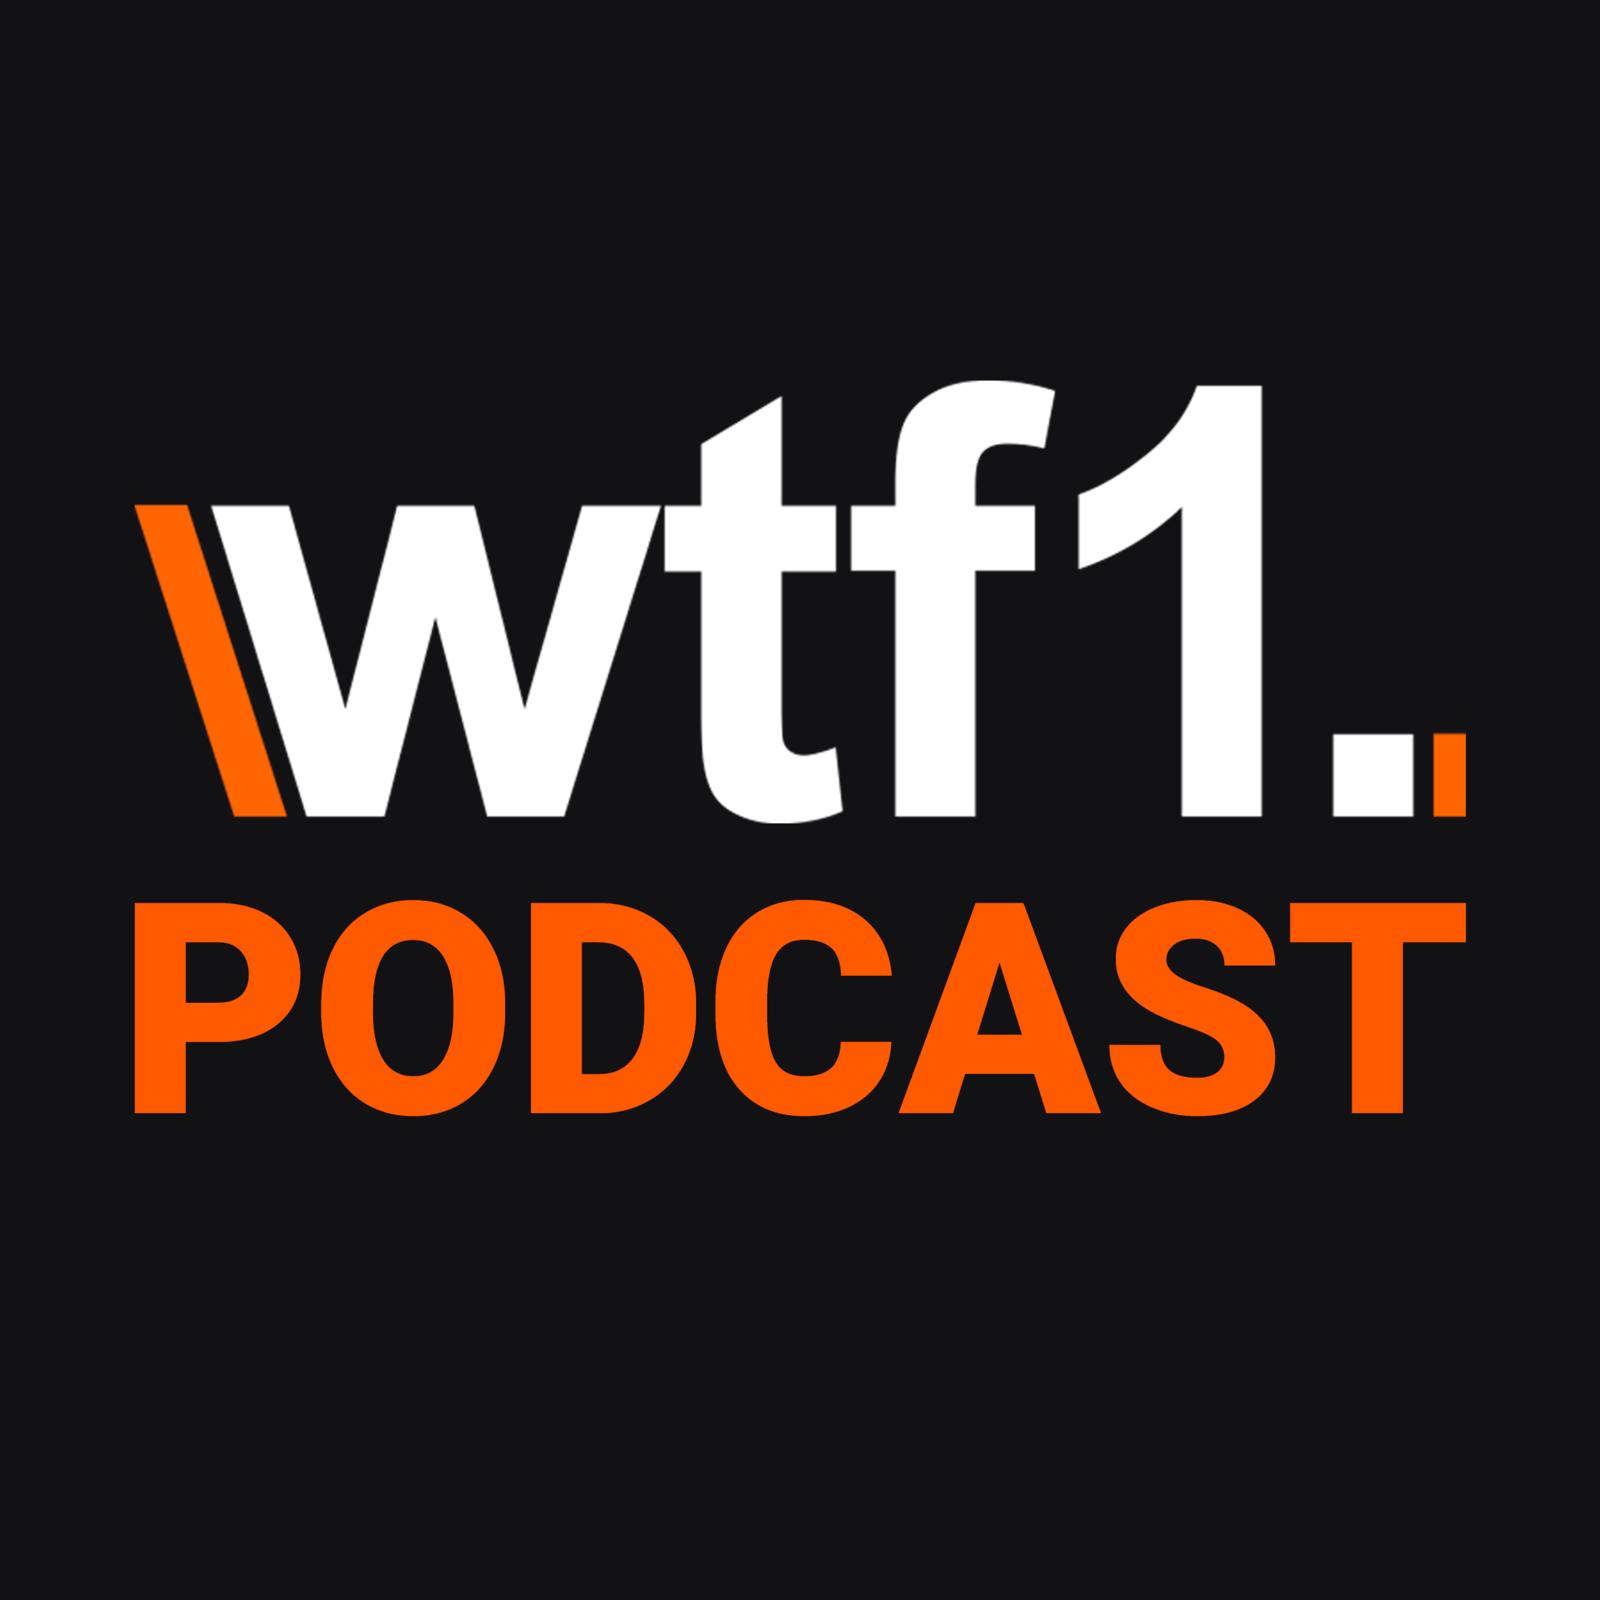 WTF1 Podcast